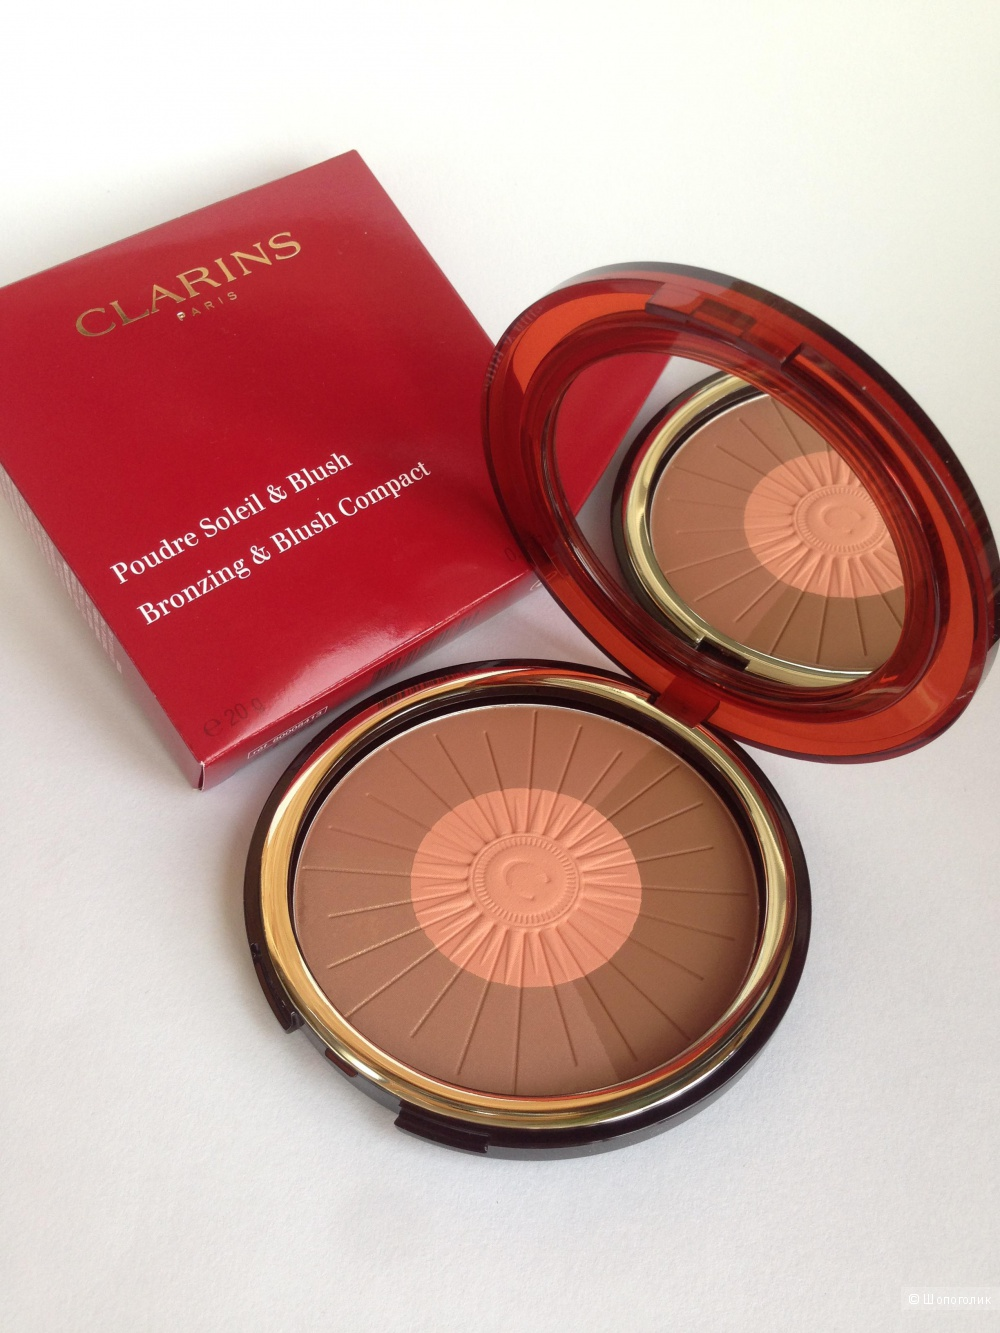 Clarins Коллекционная Пудра-бронзатор Poudre Soleil &Blush